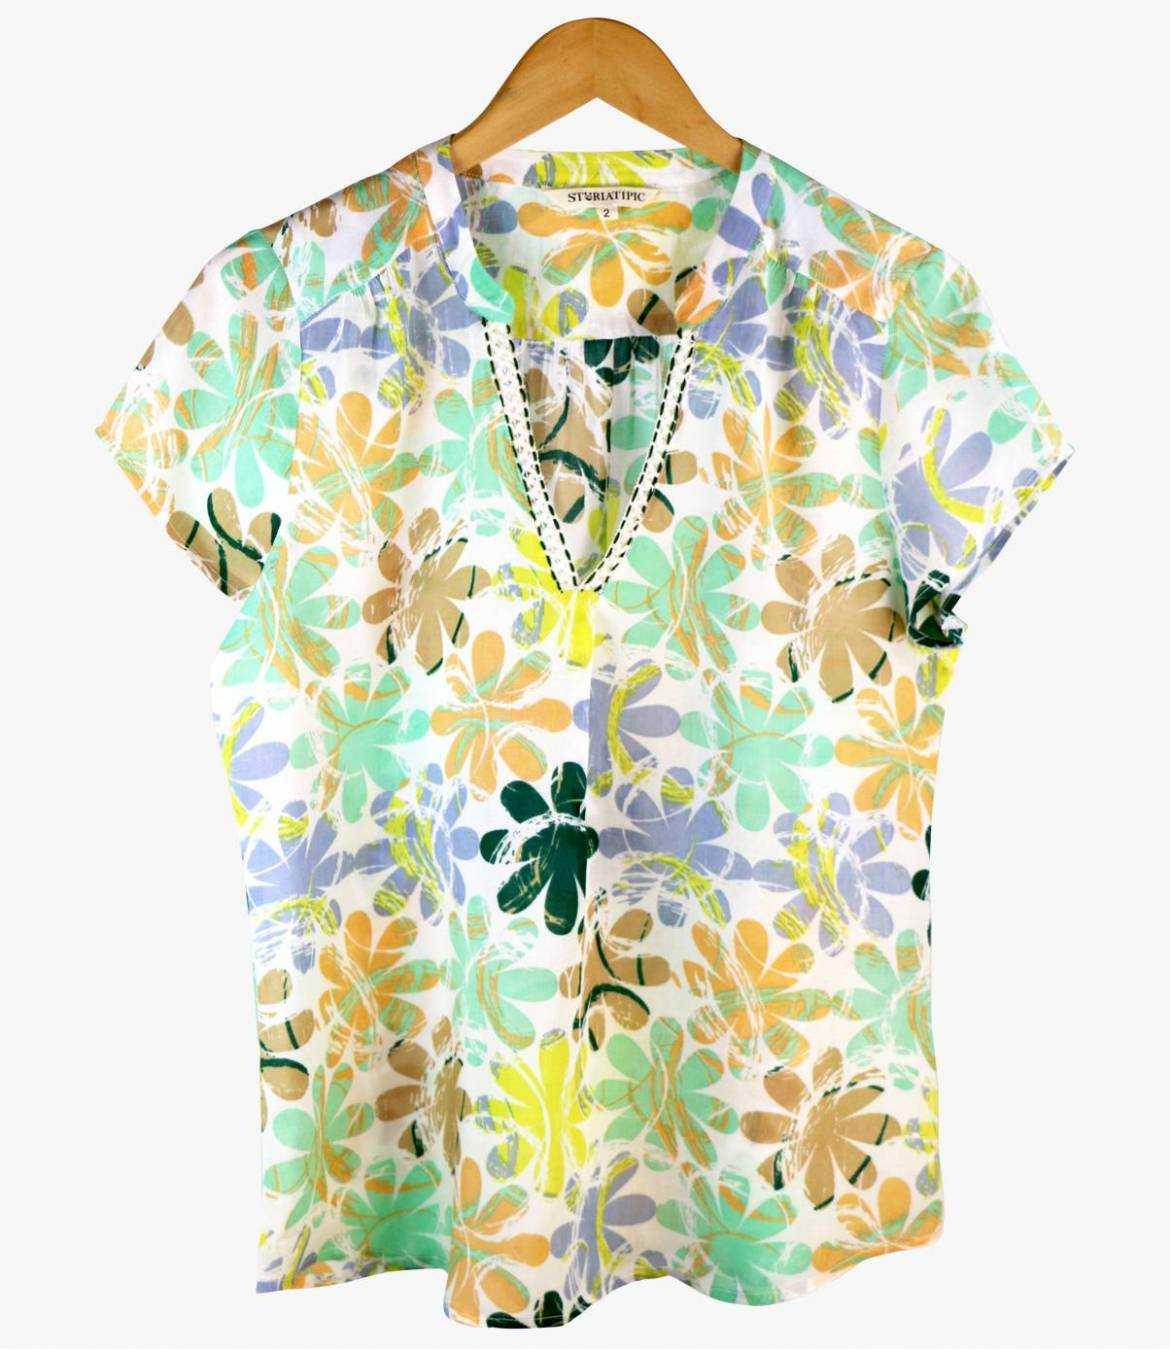 ZOE ELLY Women's Modal T-shirt Storiatipic - 4